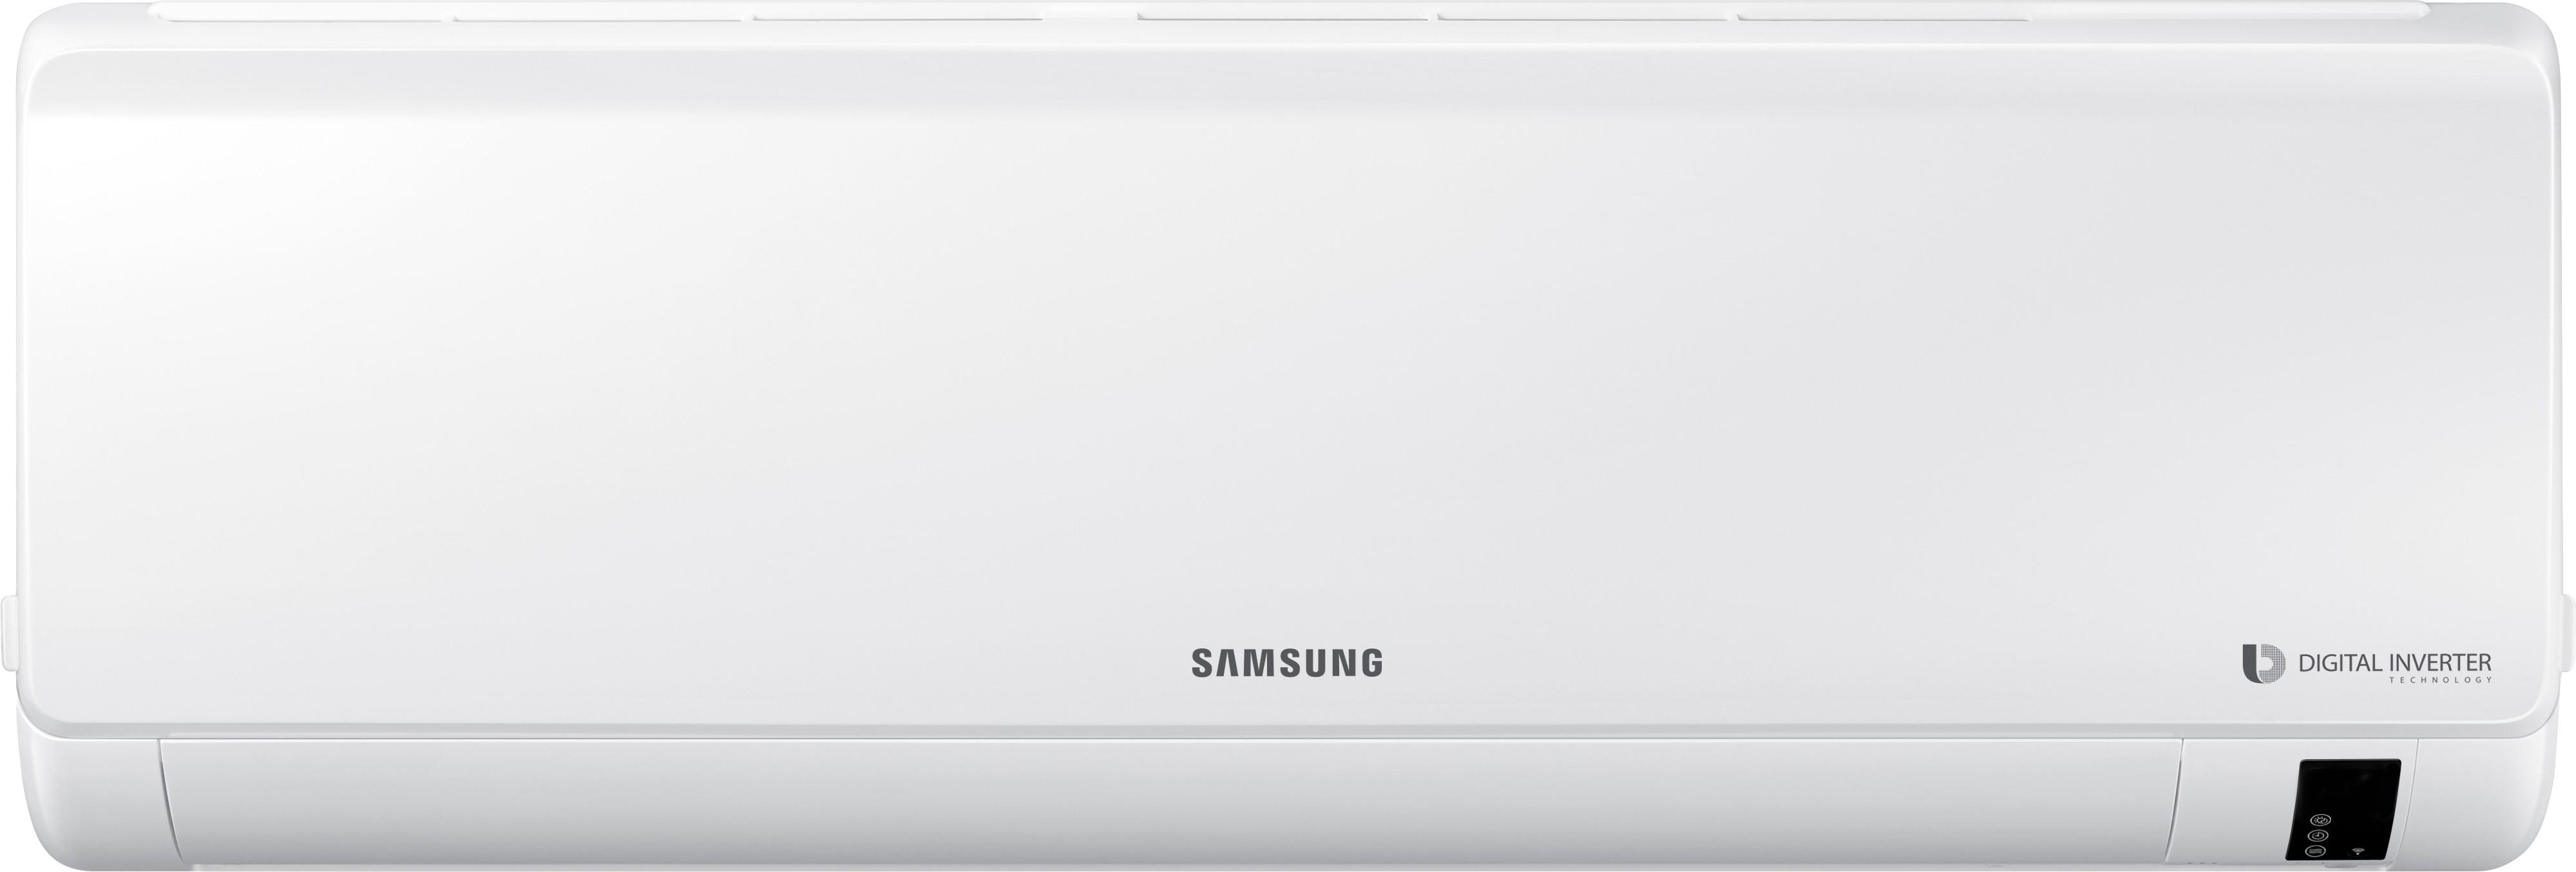 Samsung AR12MV3HEWK 1 Ton 3 Star BEE Rating 2017 Inverter AC Image